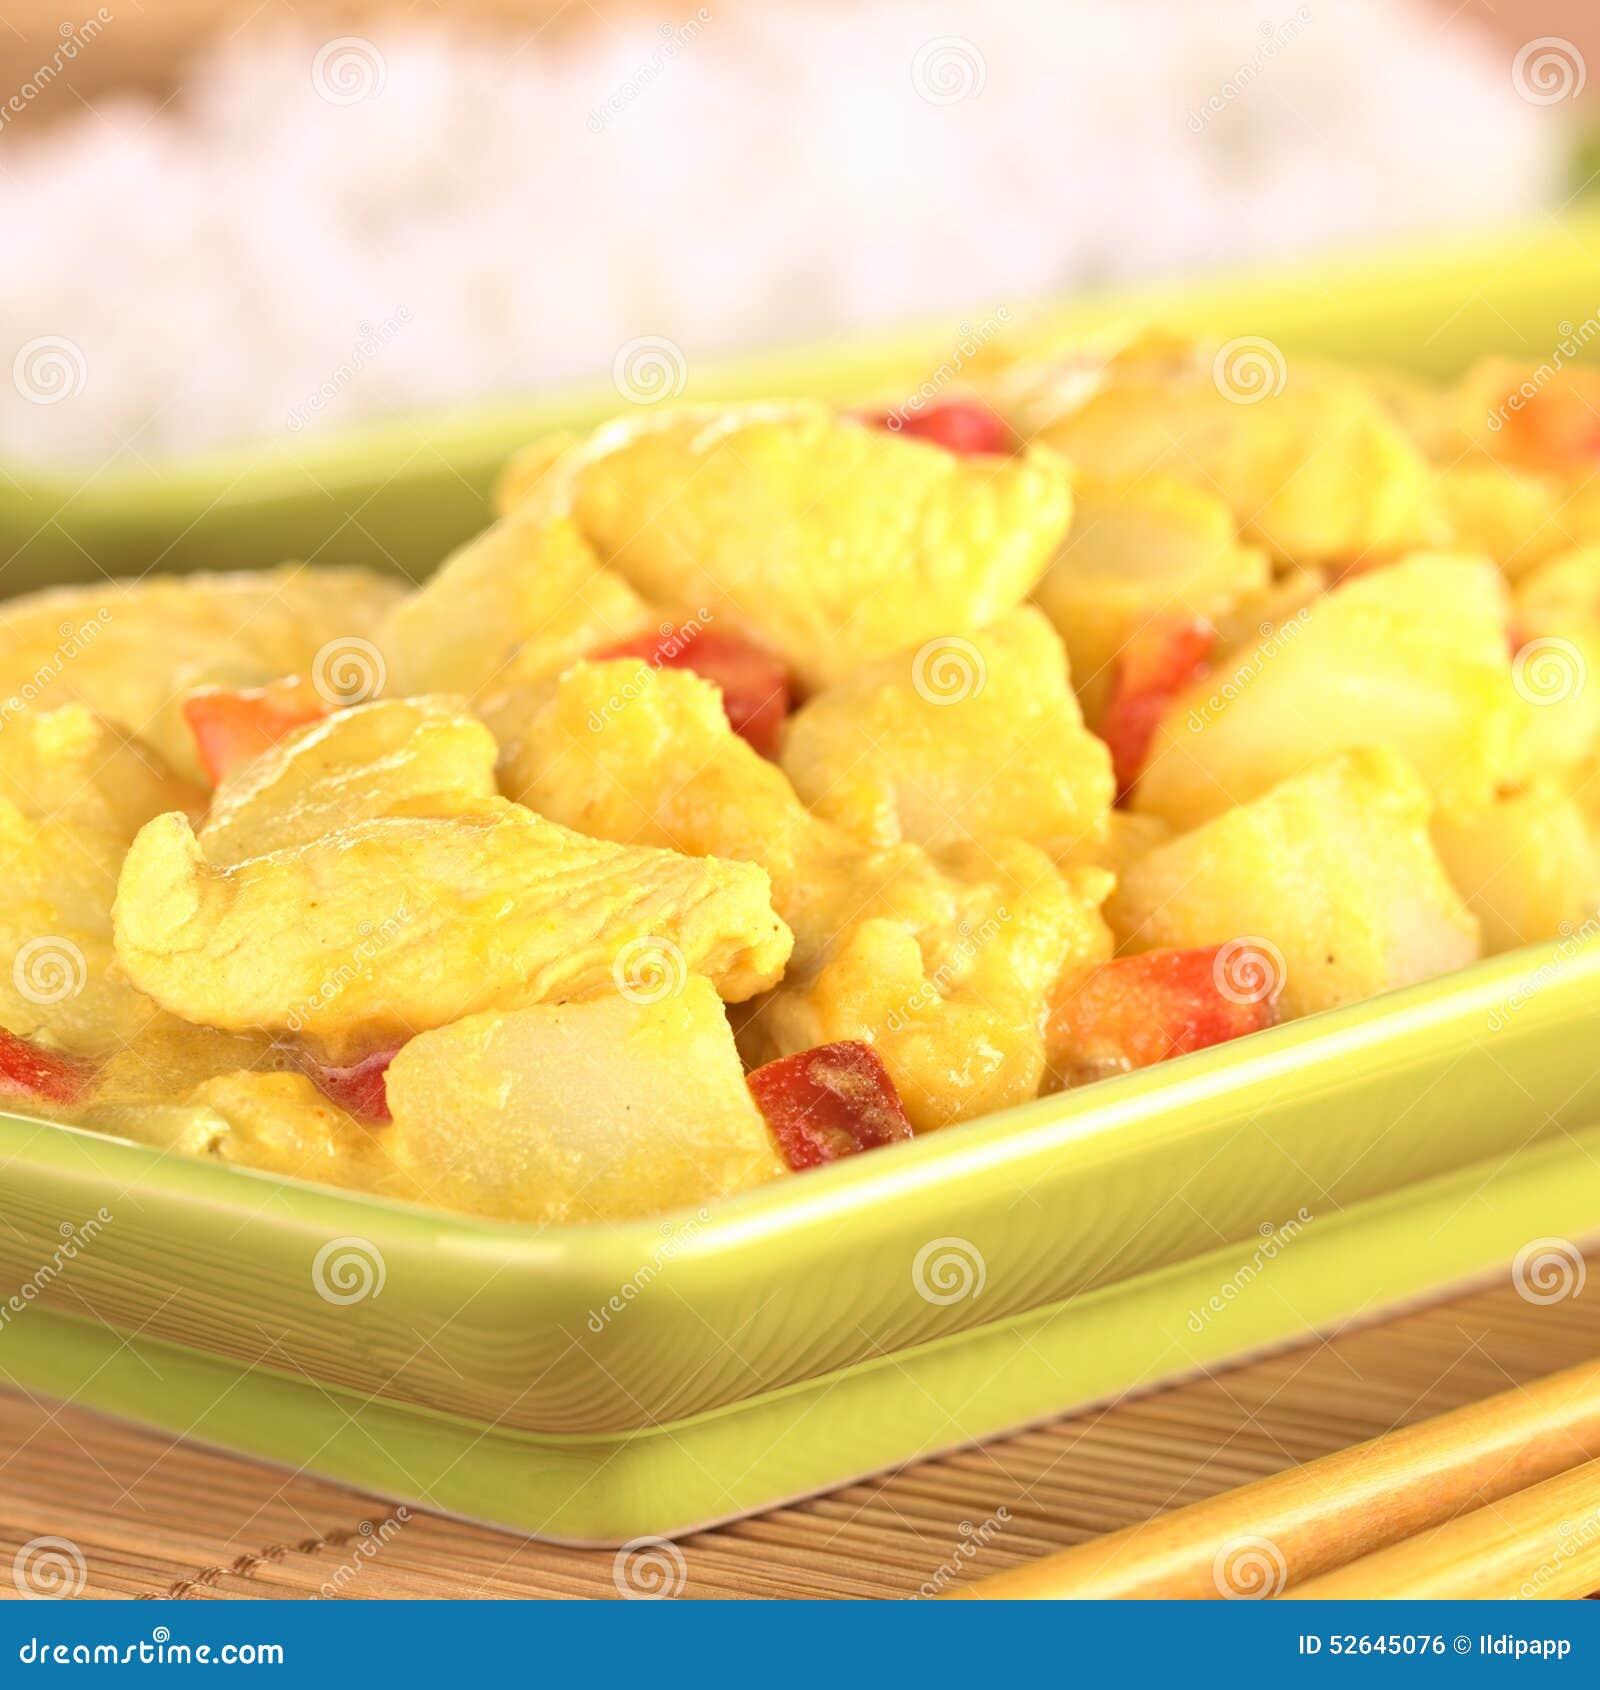 芒果�9il�..��y.�_no pr: no 1 17 0 库存照片: 鸡和芒果咖喱盘 id 52645076 © il